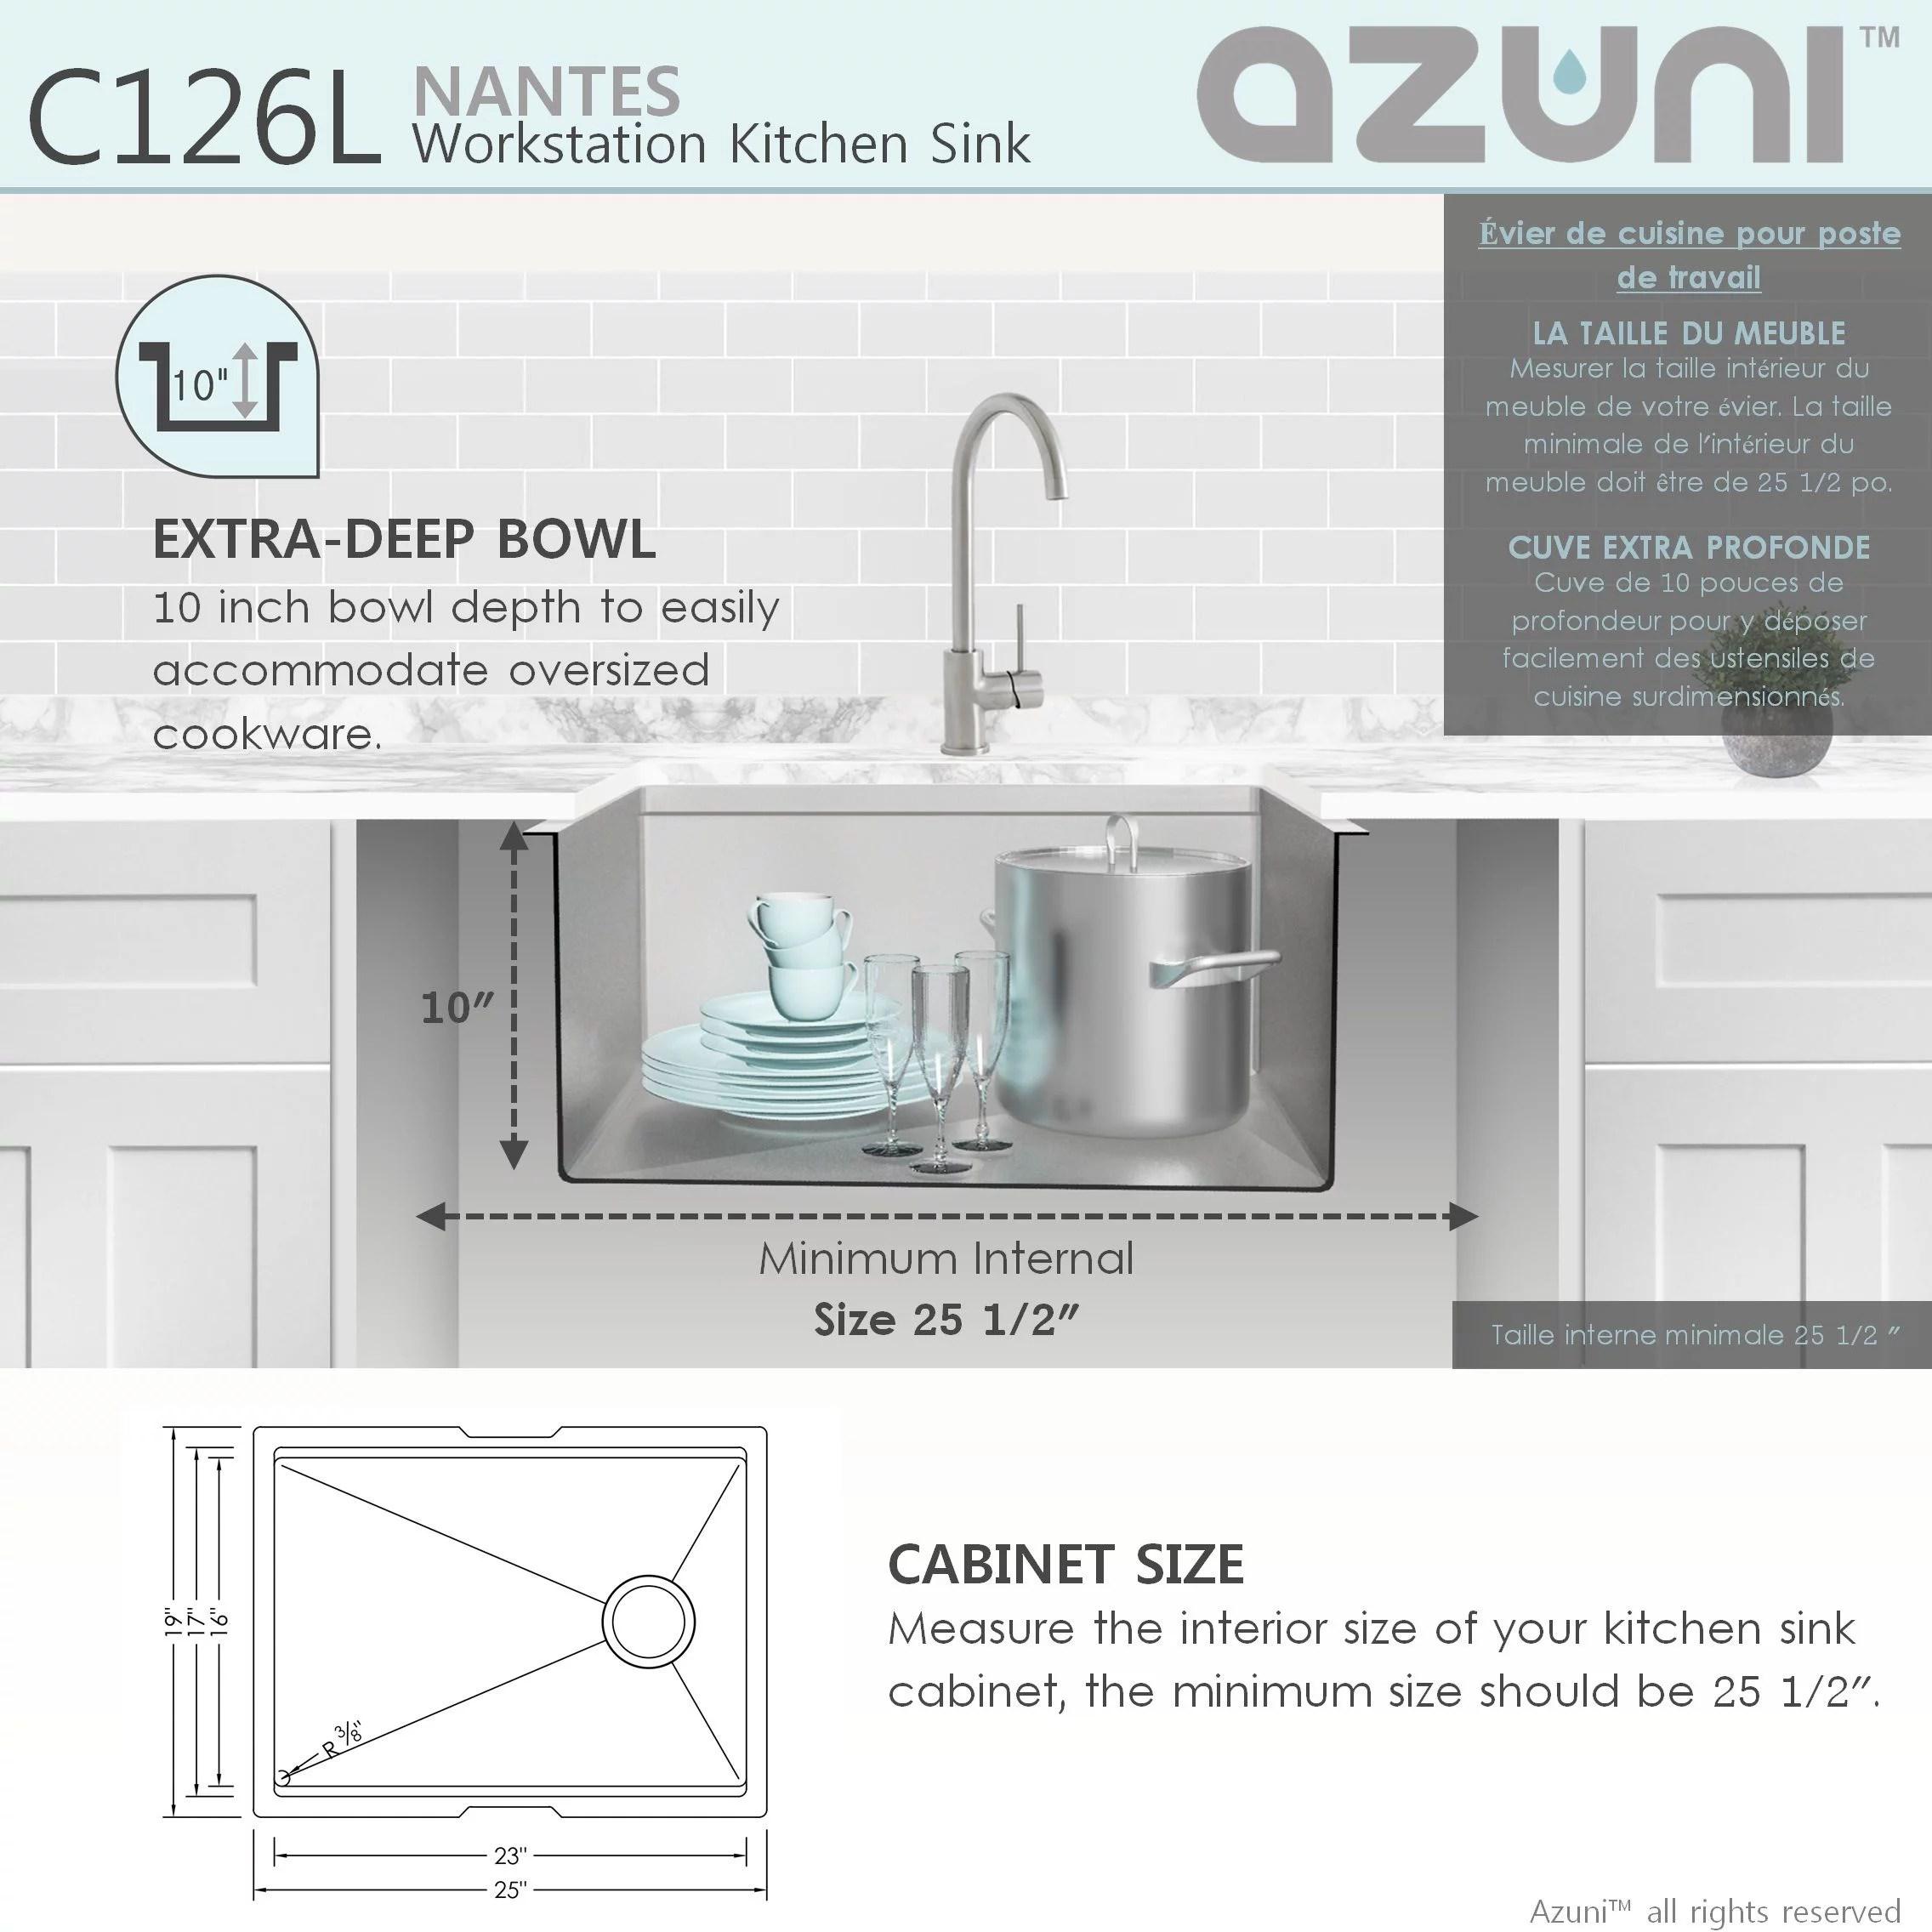 azuni 25 l x 19 w single bowl undermount 16g reversible workstation kitchen sink with accessories c126l